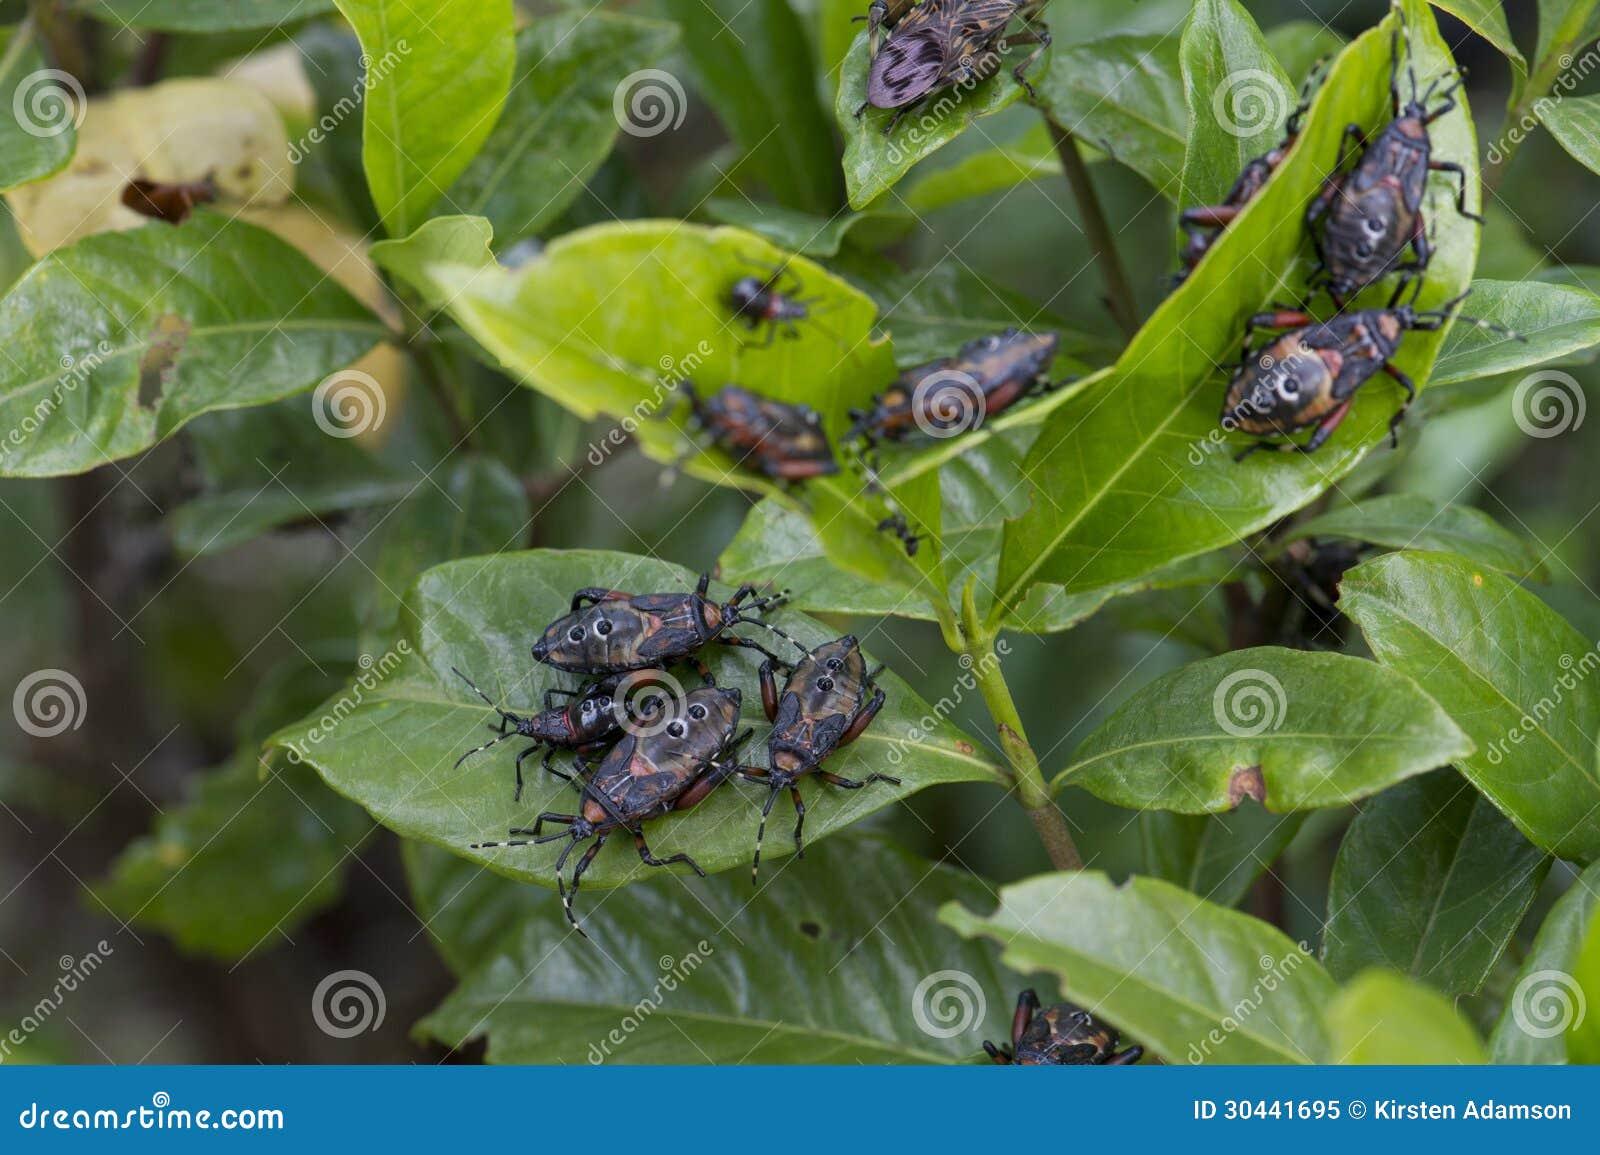 garden pests royalty free stock photo image 30441695